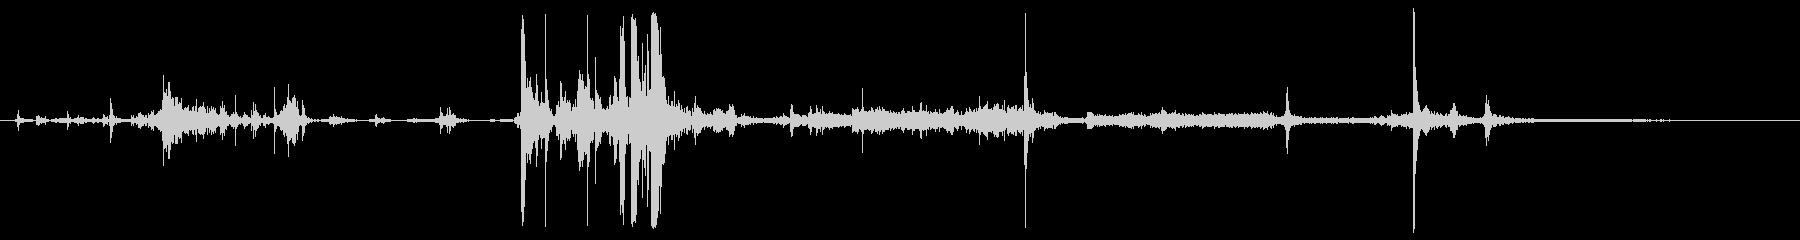 Vcrデッキ; VhsテープをVc...の未再生の波形